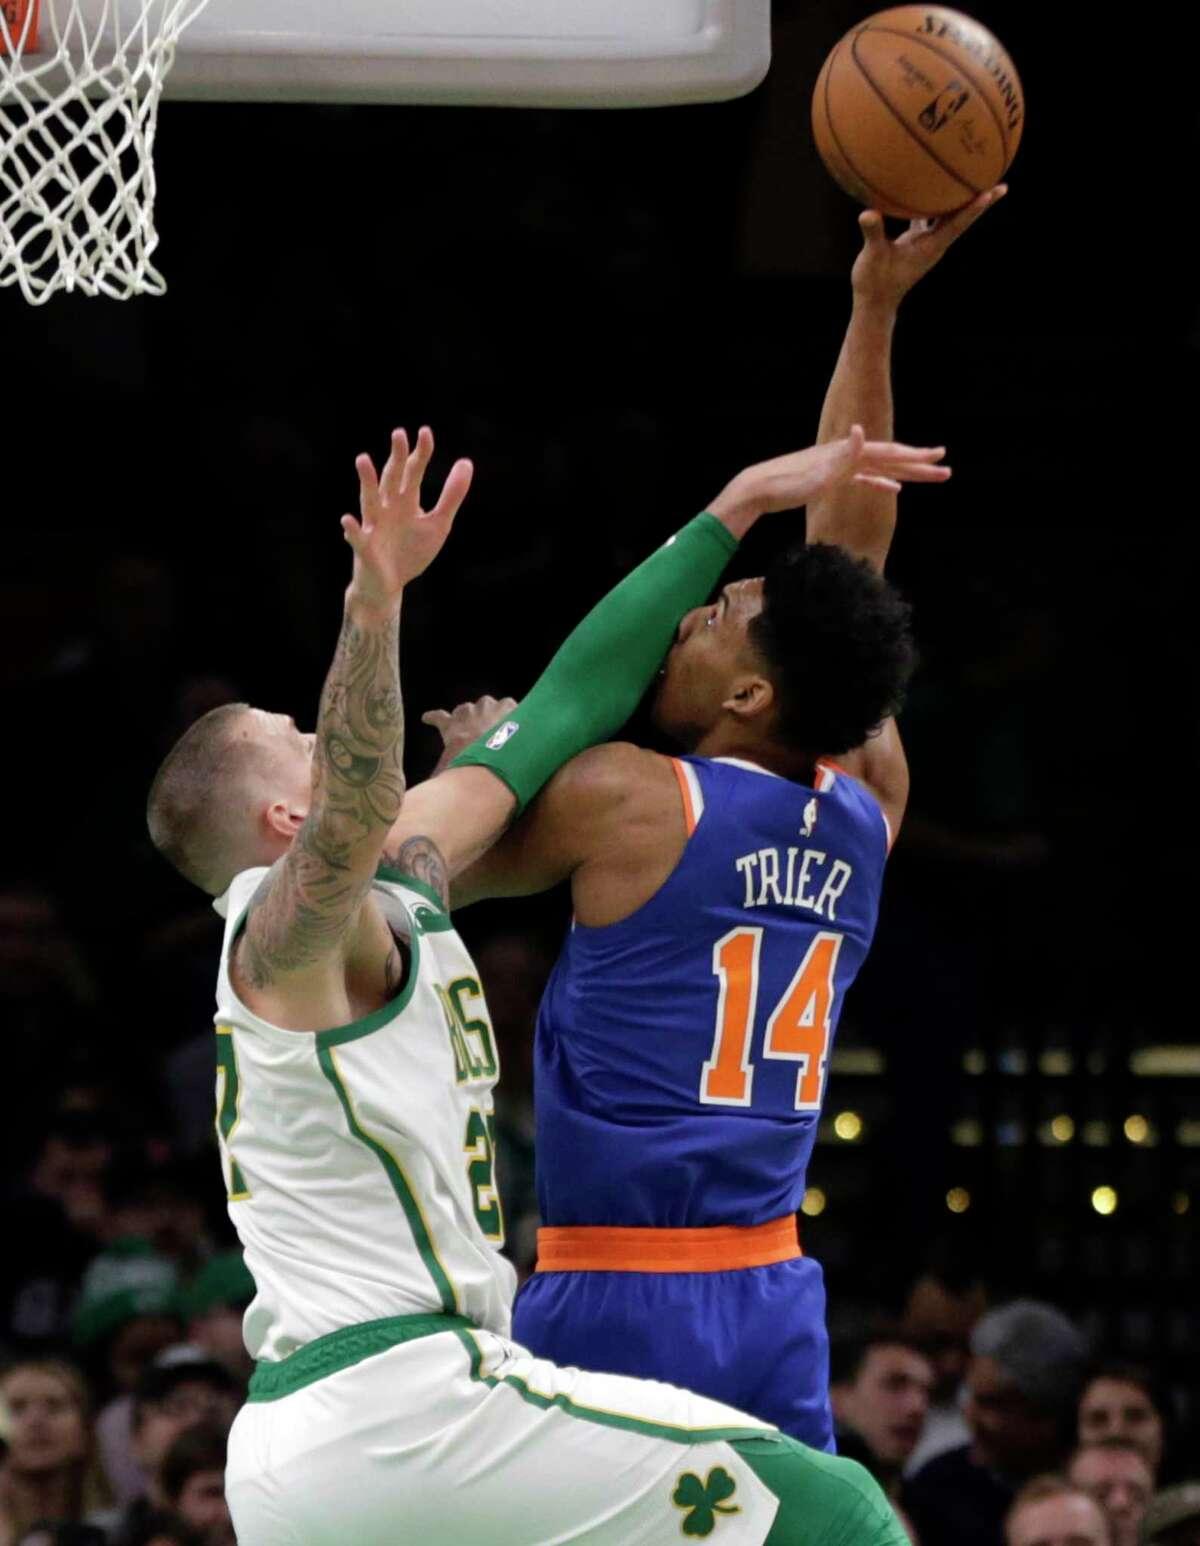 New York Knicks guard Allonzo Trier (14) tries to shoot over Boston Celtics forward Daniel Theis (27) during the first quarter of an NBA basketball game Thursday, Dec. 6, 2018, in Boston. (AP Photo/Elise Amendola)